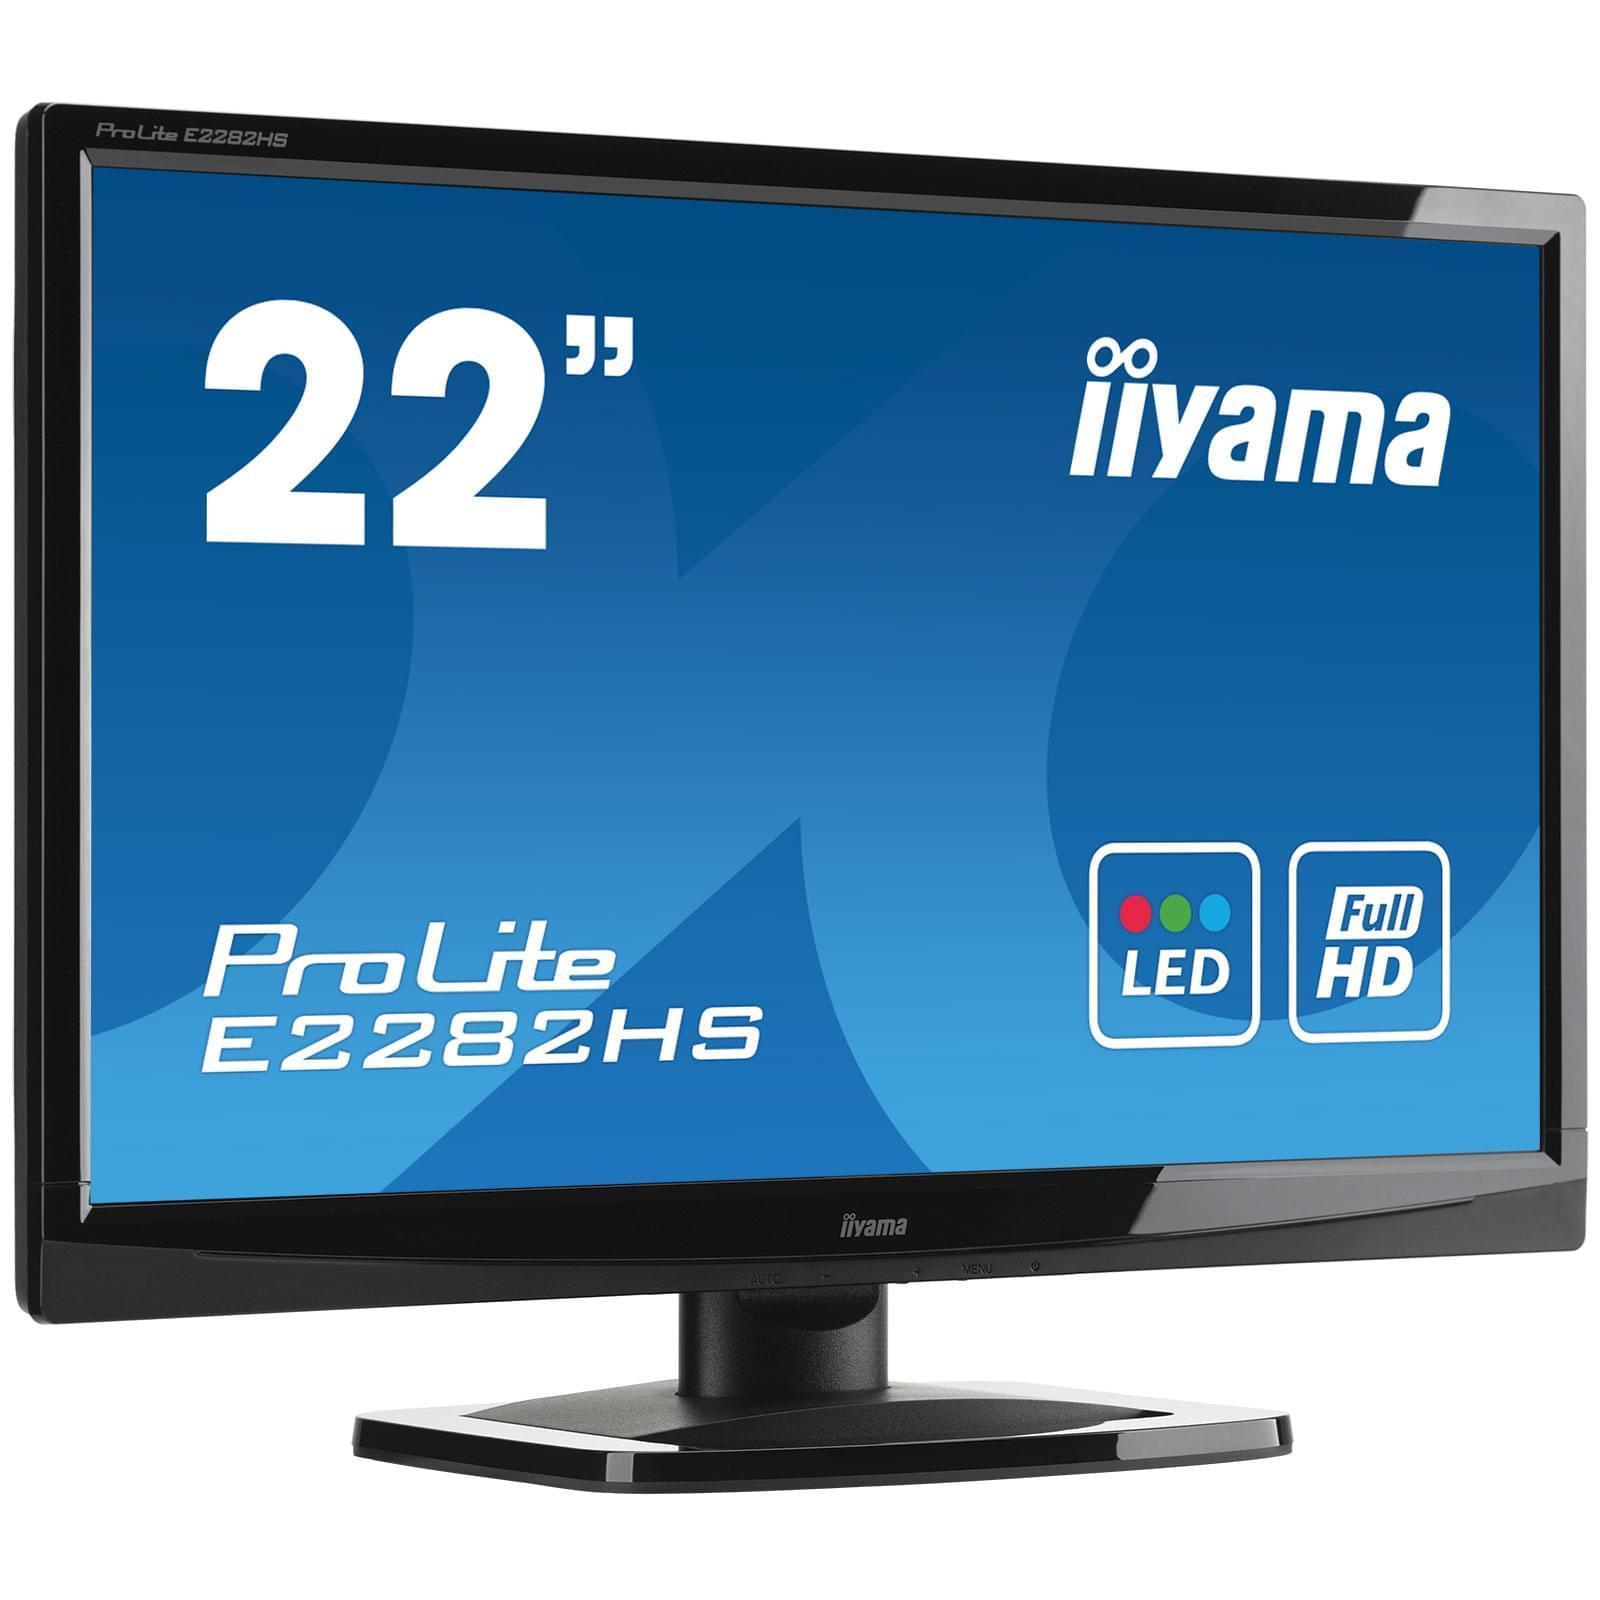 Iiyama E2282HS-GB1 (E2282HS-GB1) - Achat / Vente Ecran PC sur Cybertek.fr - 0